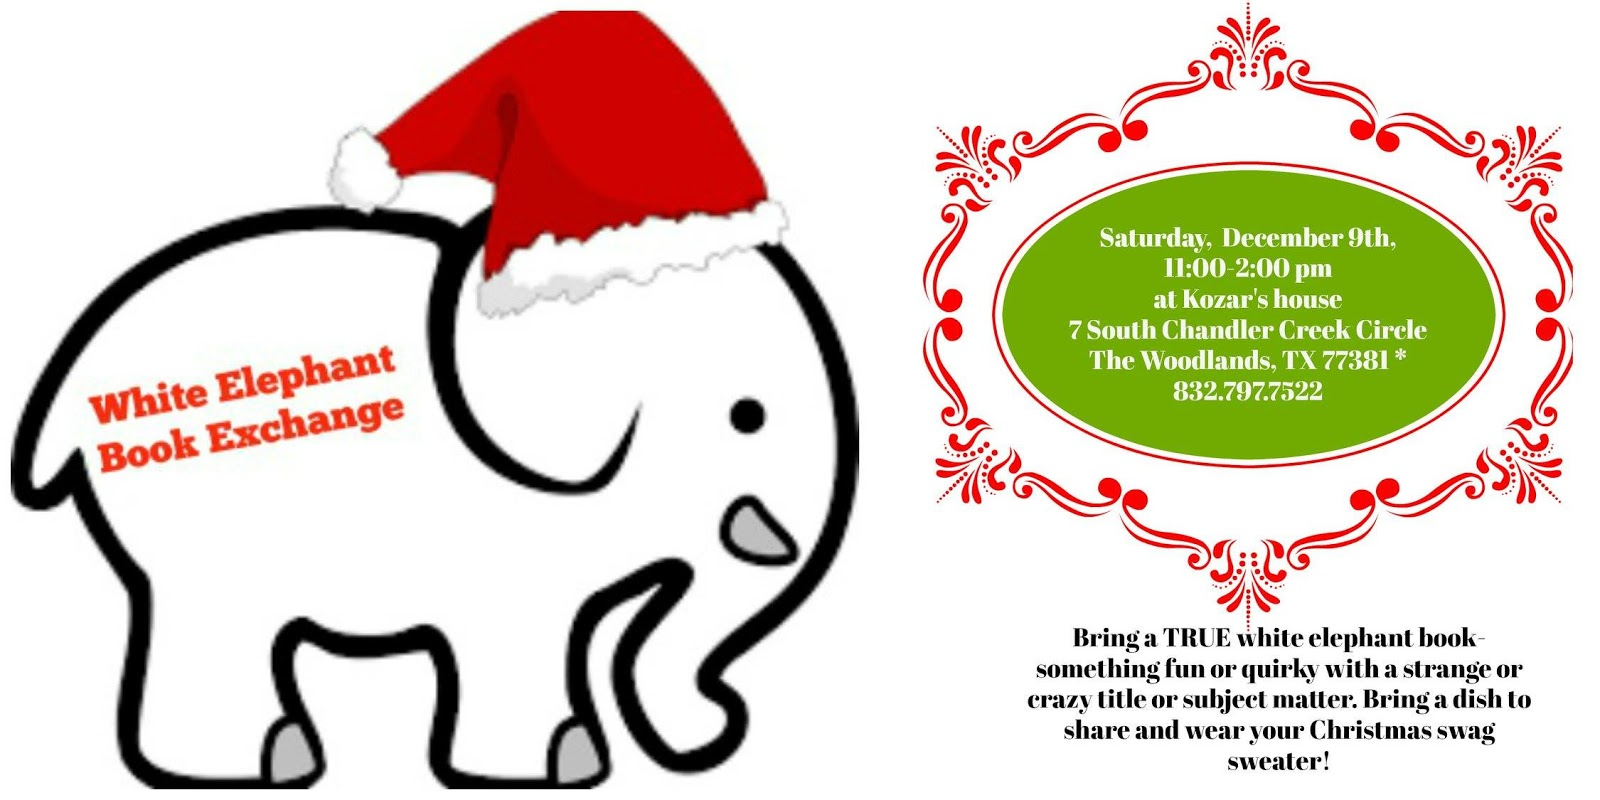 christmas 2017 white elephant book exchange - Christmas White Elephant